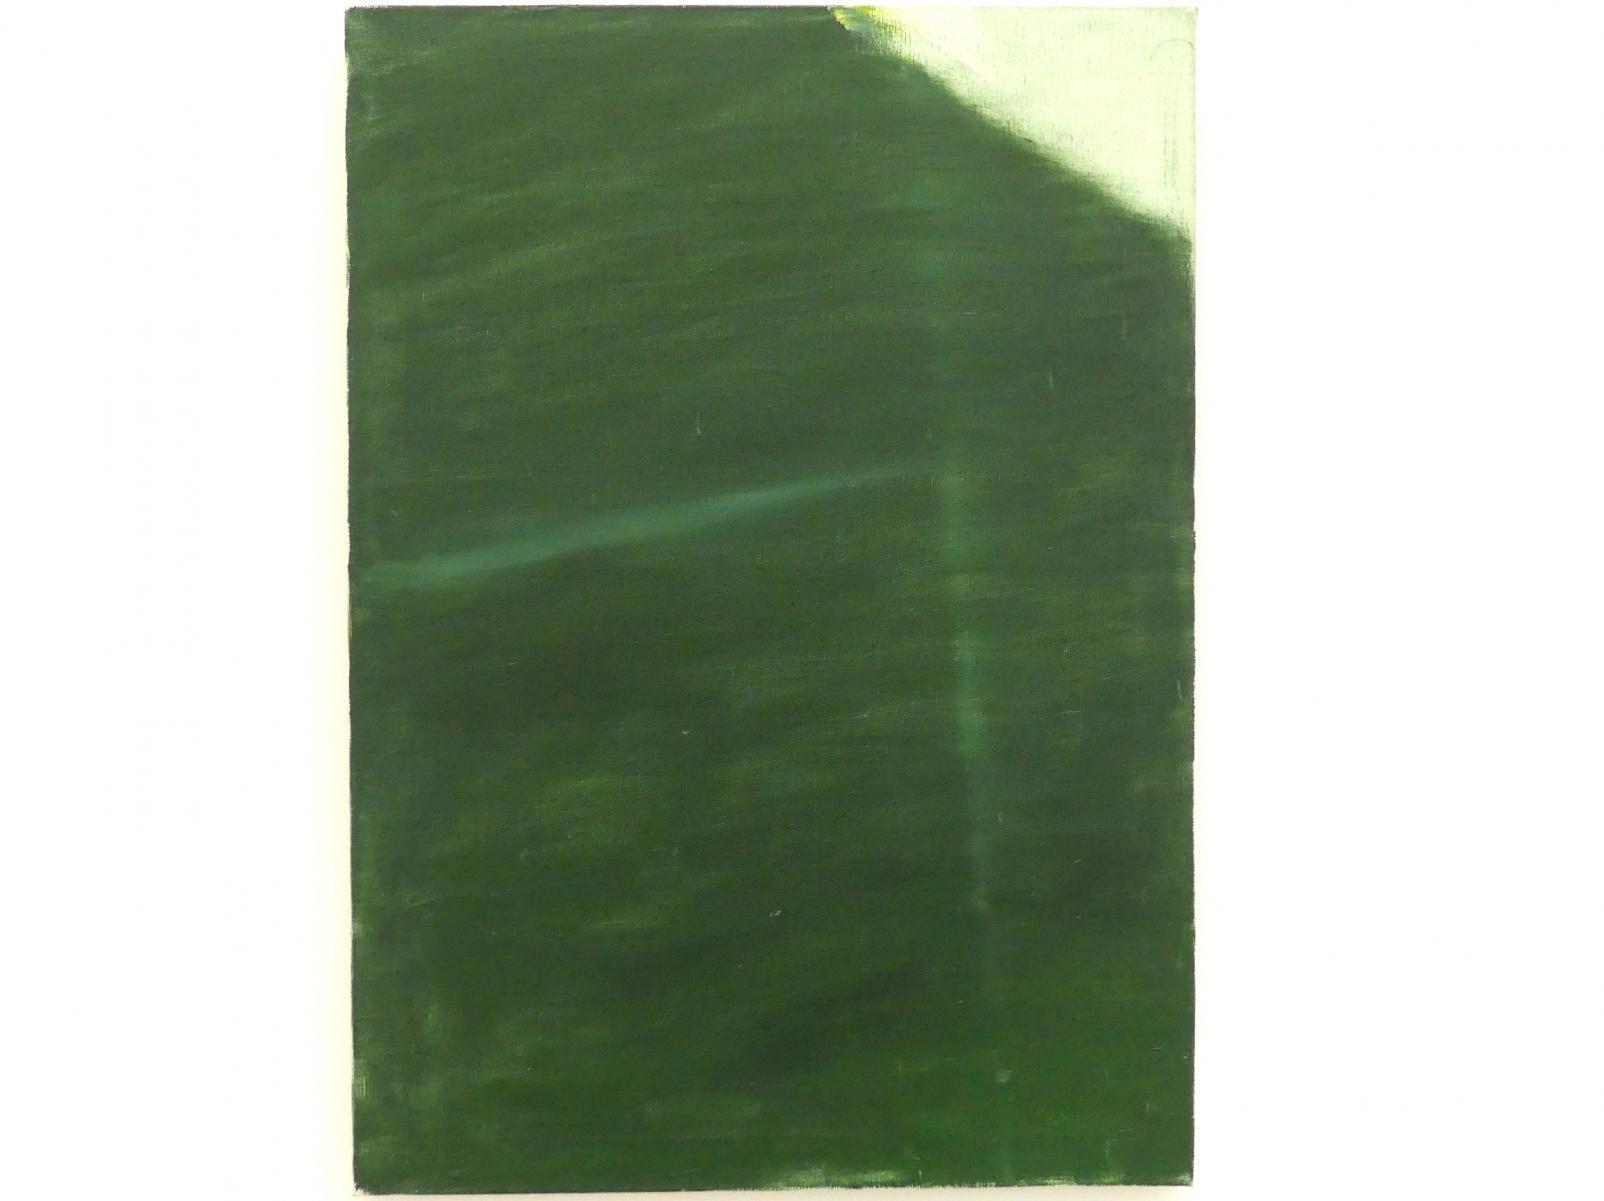 Raoul De Keyser: Untitled, 1988